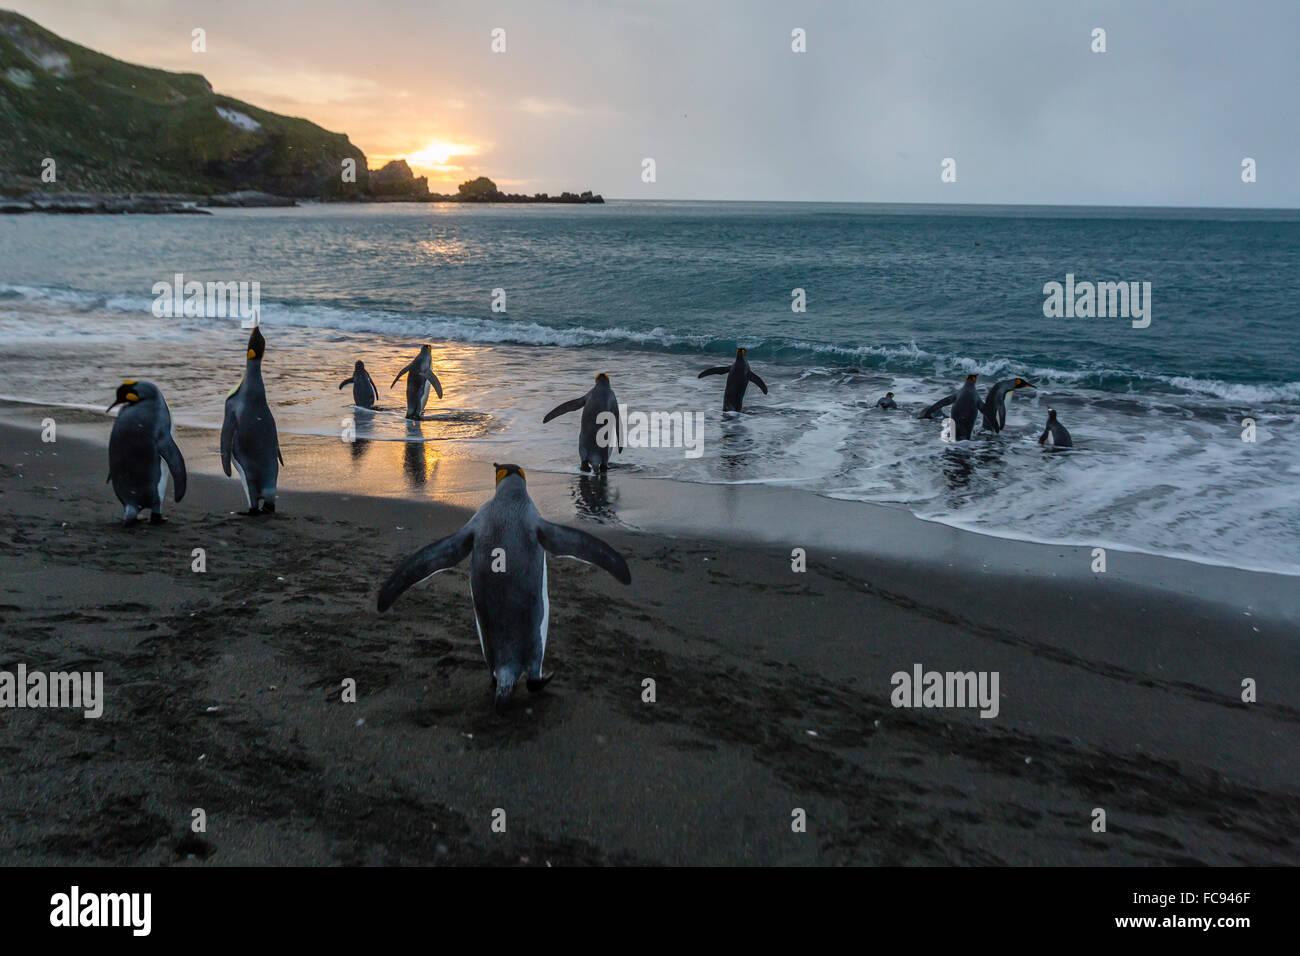 King penguins (Aptenodytes patagonicus) returning to the sea at sunrise at Gold Harbour, South Georgia, Polar Regions - Stock Image